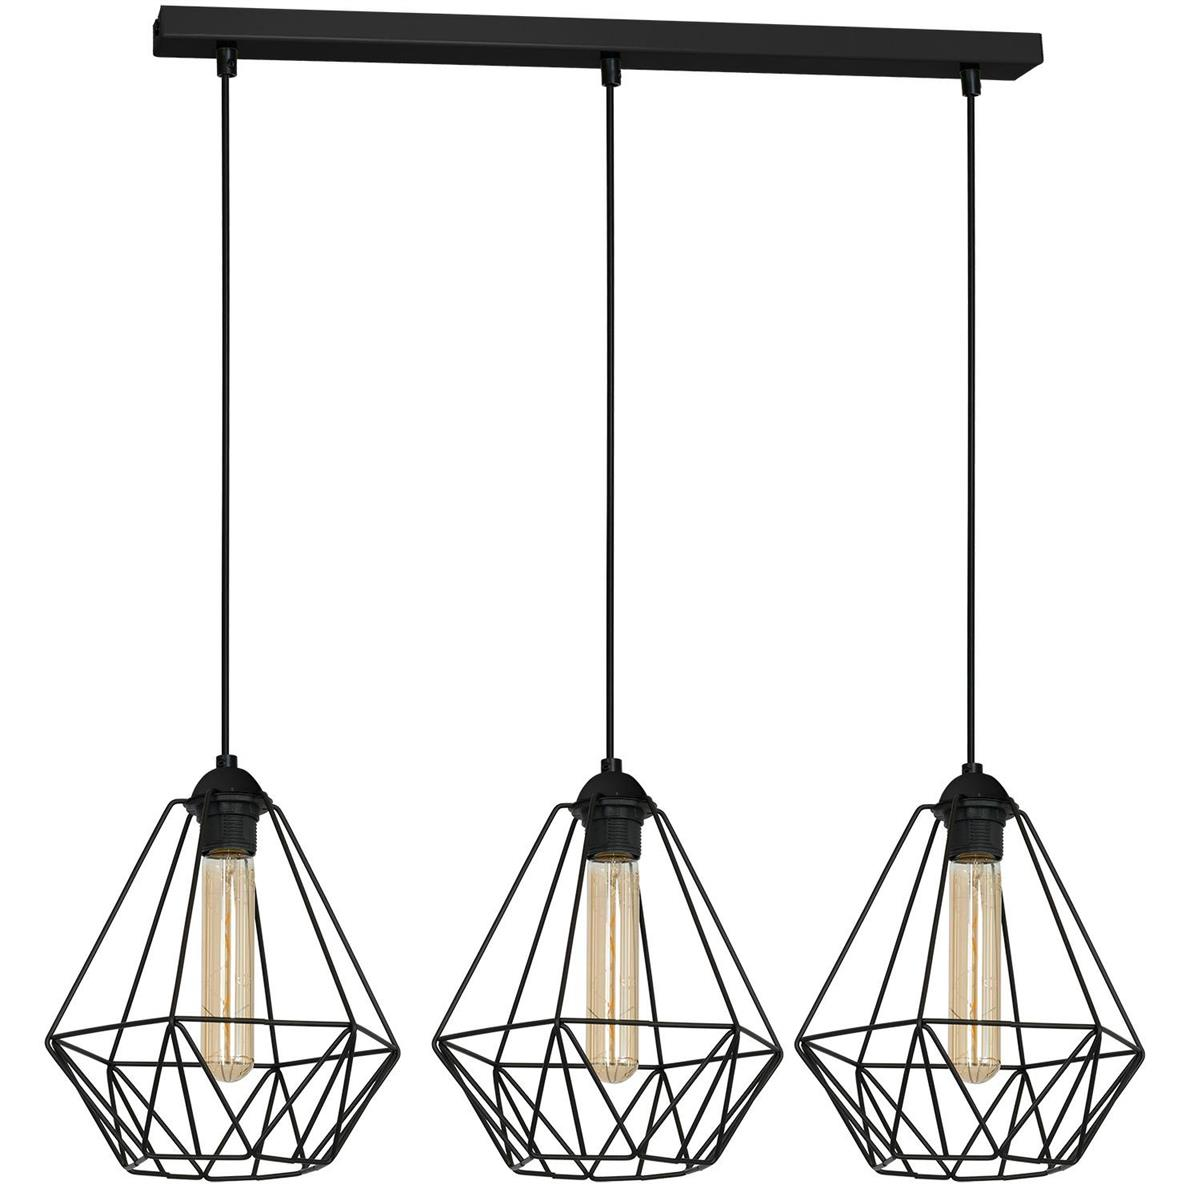 Lampa druciak kinkiet czarny x3 LOFT